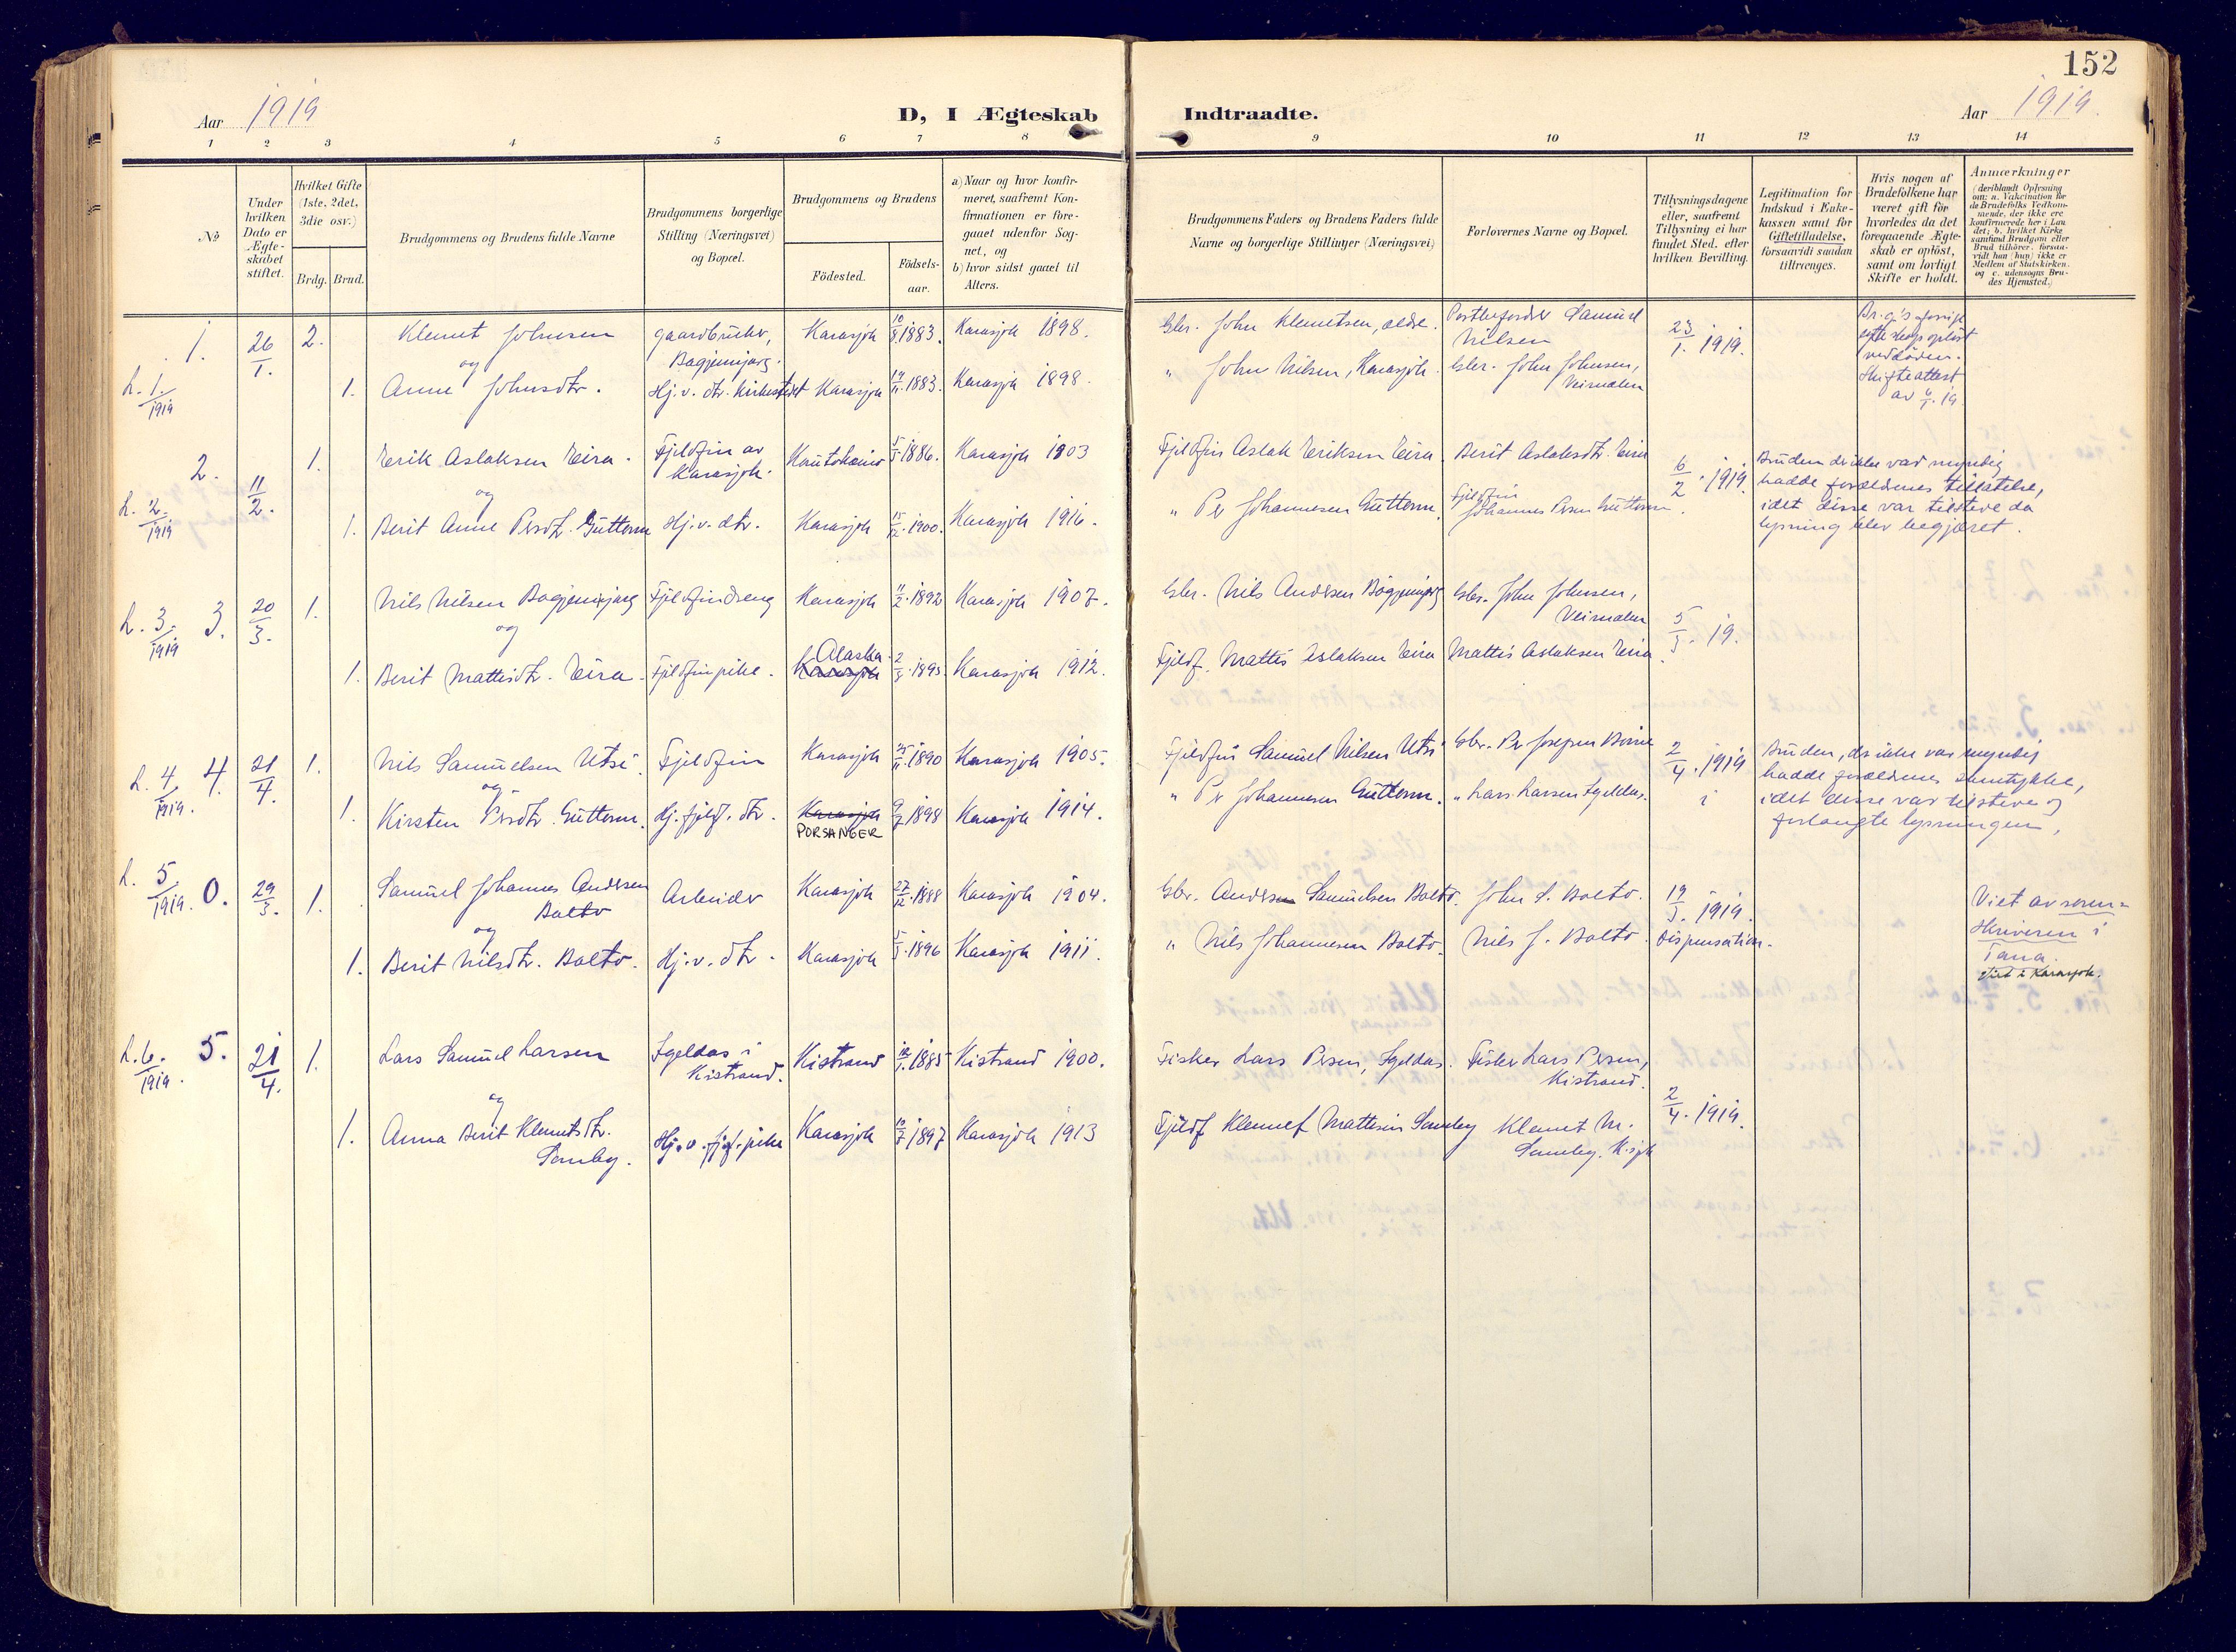 SATØ, Karasjok sokneprestkontor, H/Ha: Ministerialbok nr. 3, 1907-1926, s. 152